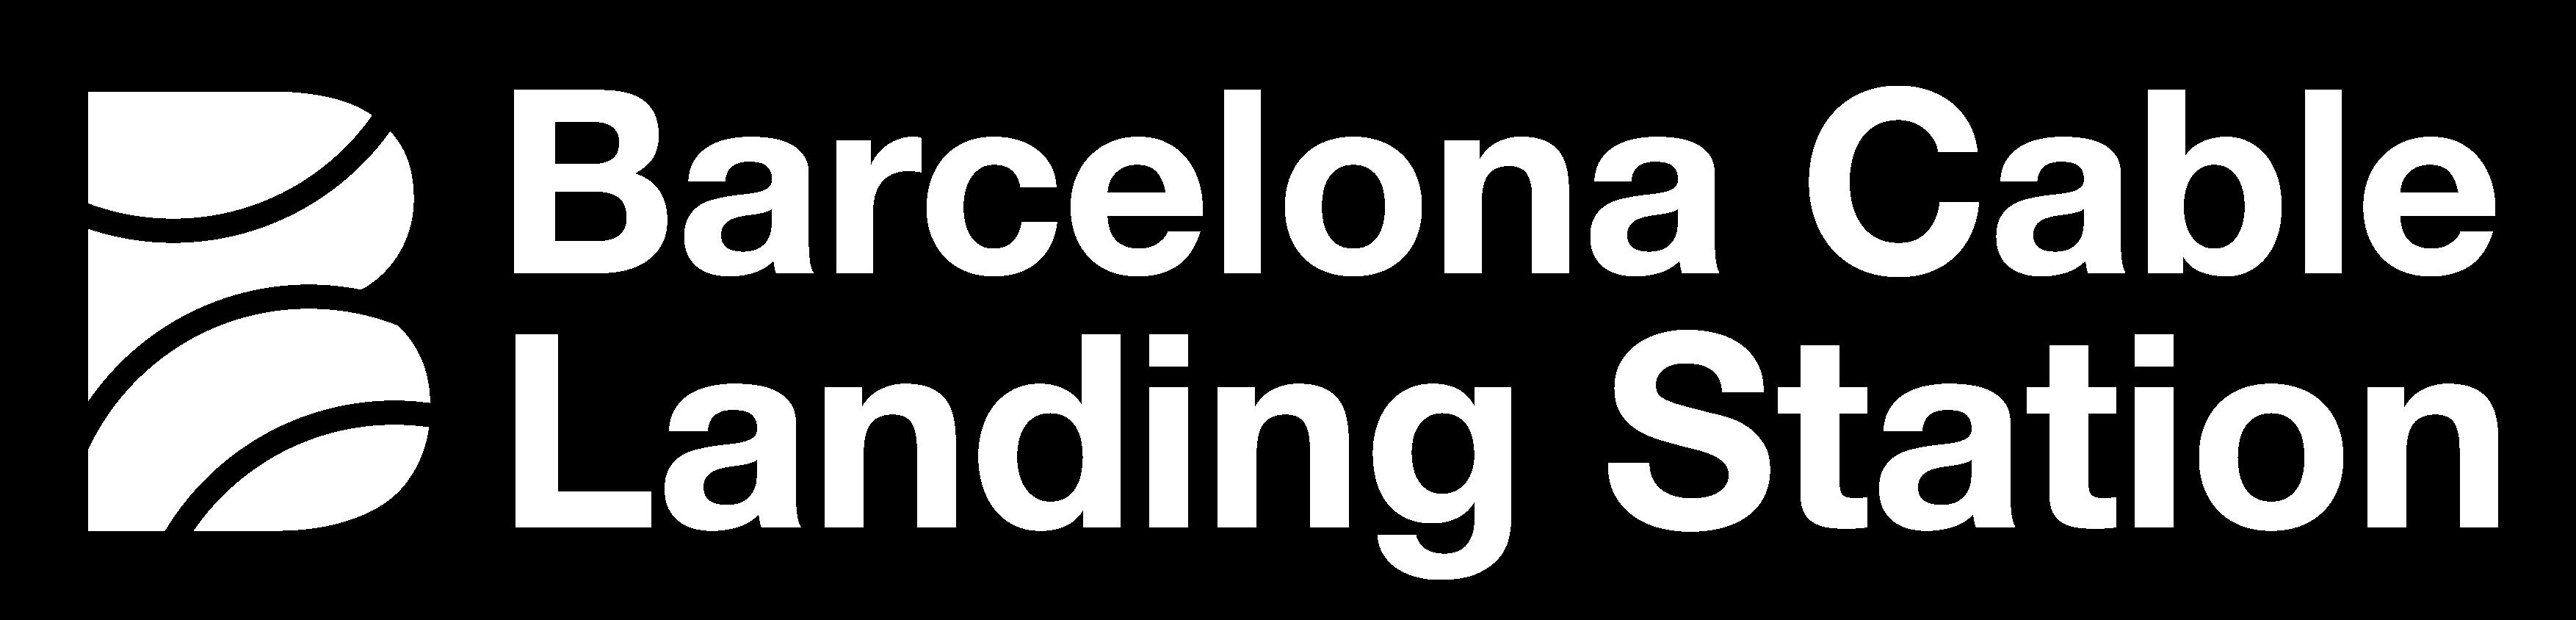 BCN CLS logo white